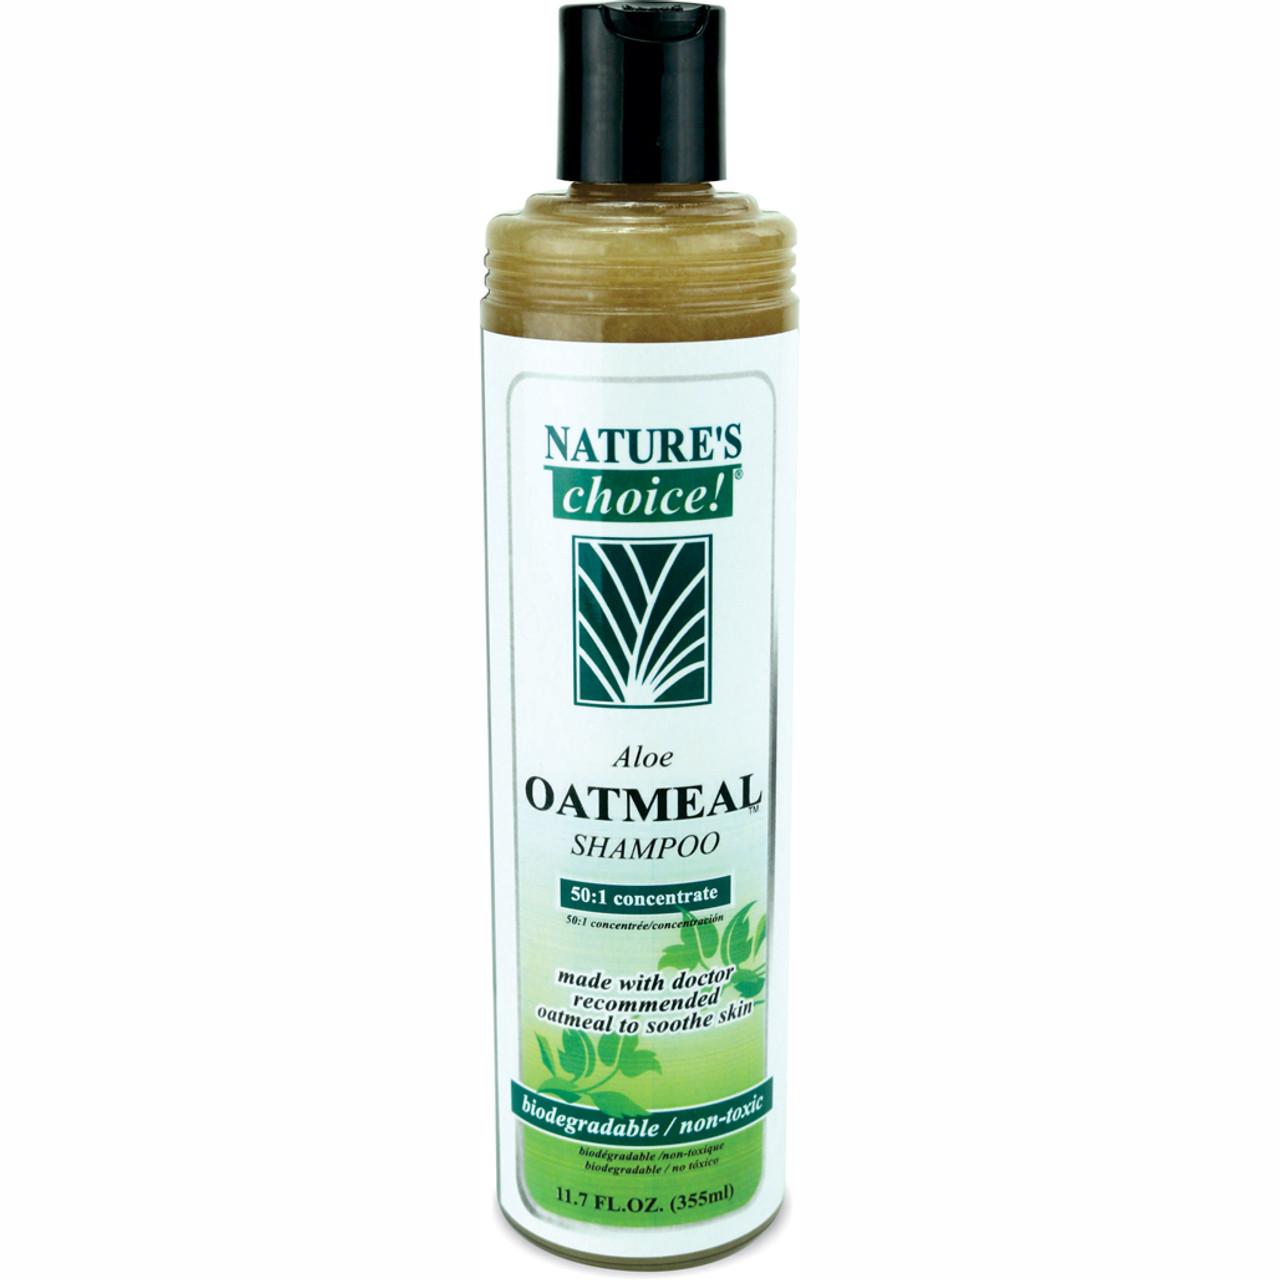 Aloe Oatmeal Shampoo in 11.7 oz size.